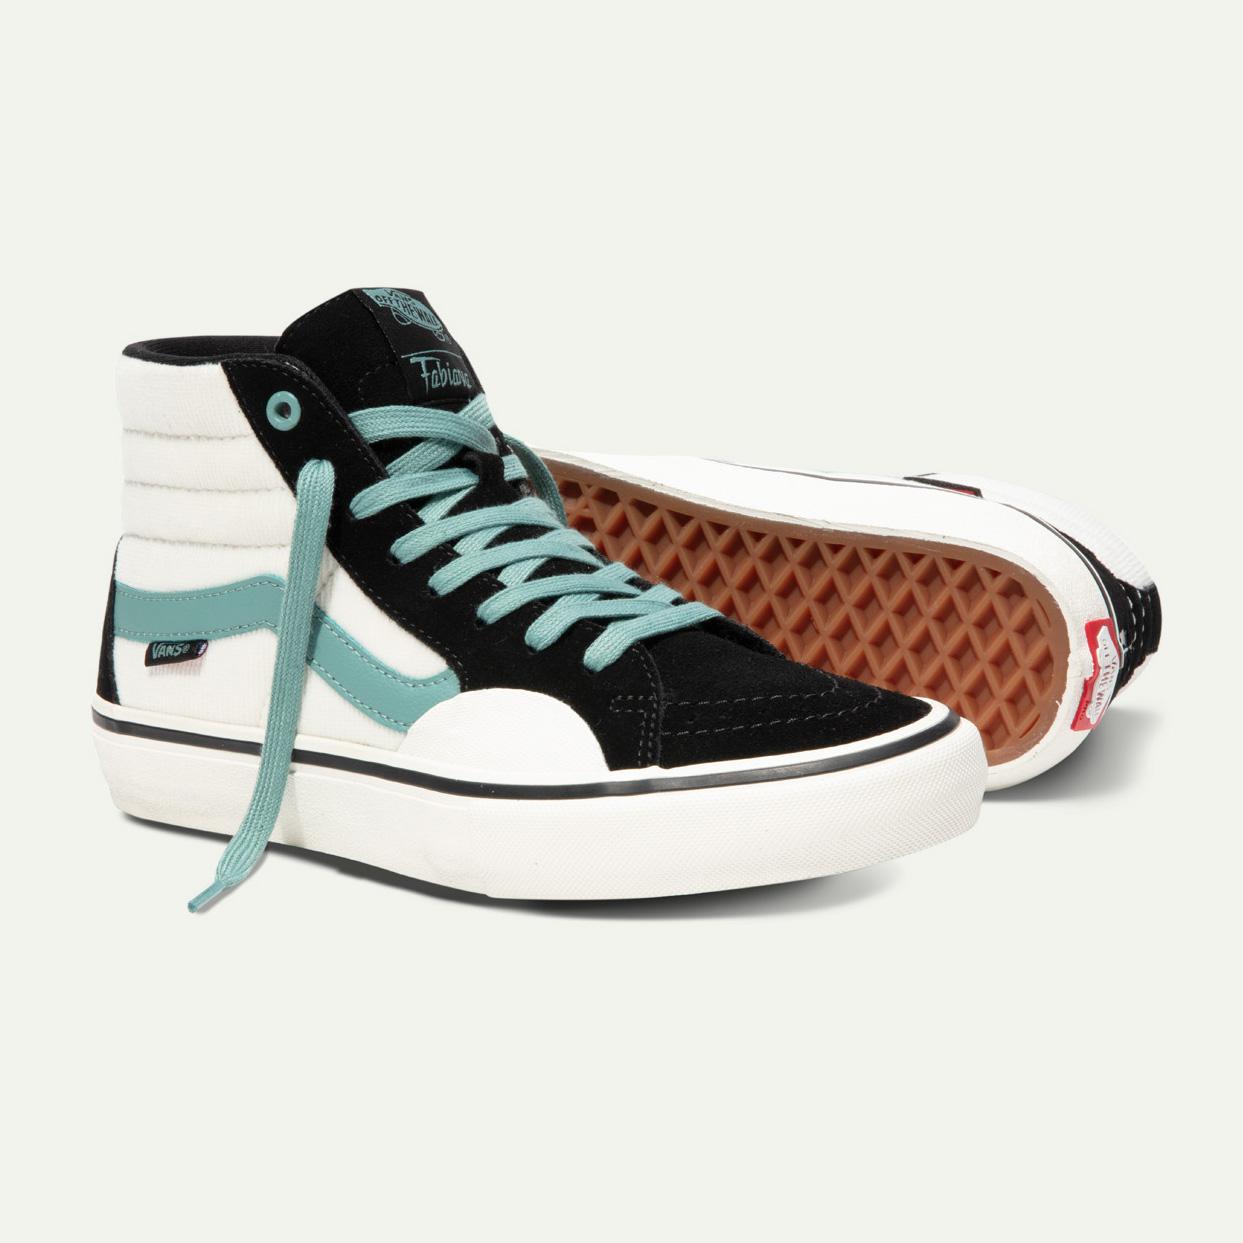 FABIANA DELFINO × VANS SK8-Hi プロ high-cut-sneaker-ladies-style-vans-sk8-hi